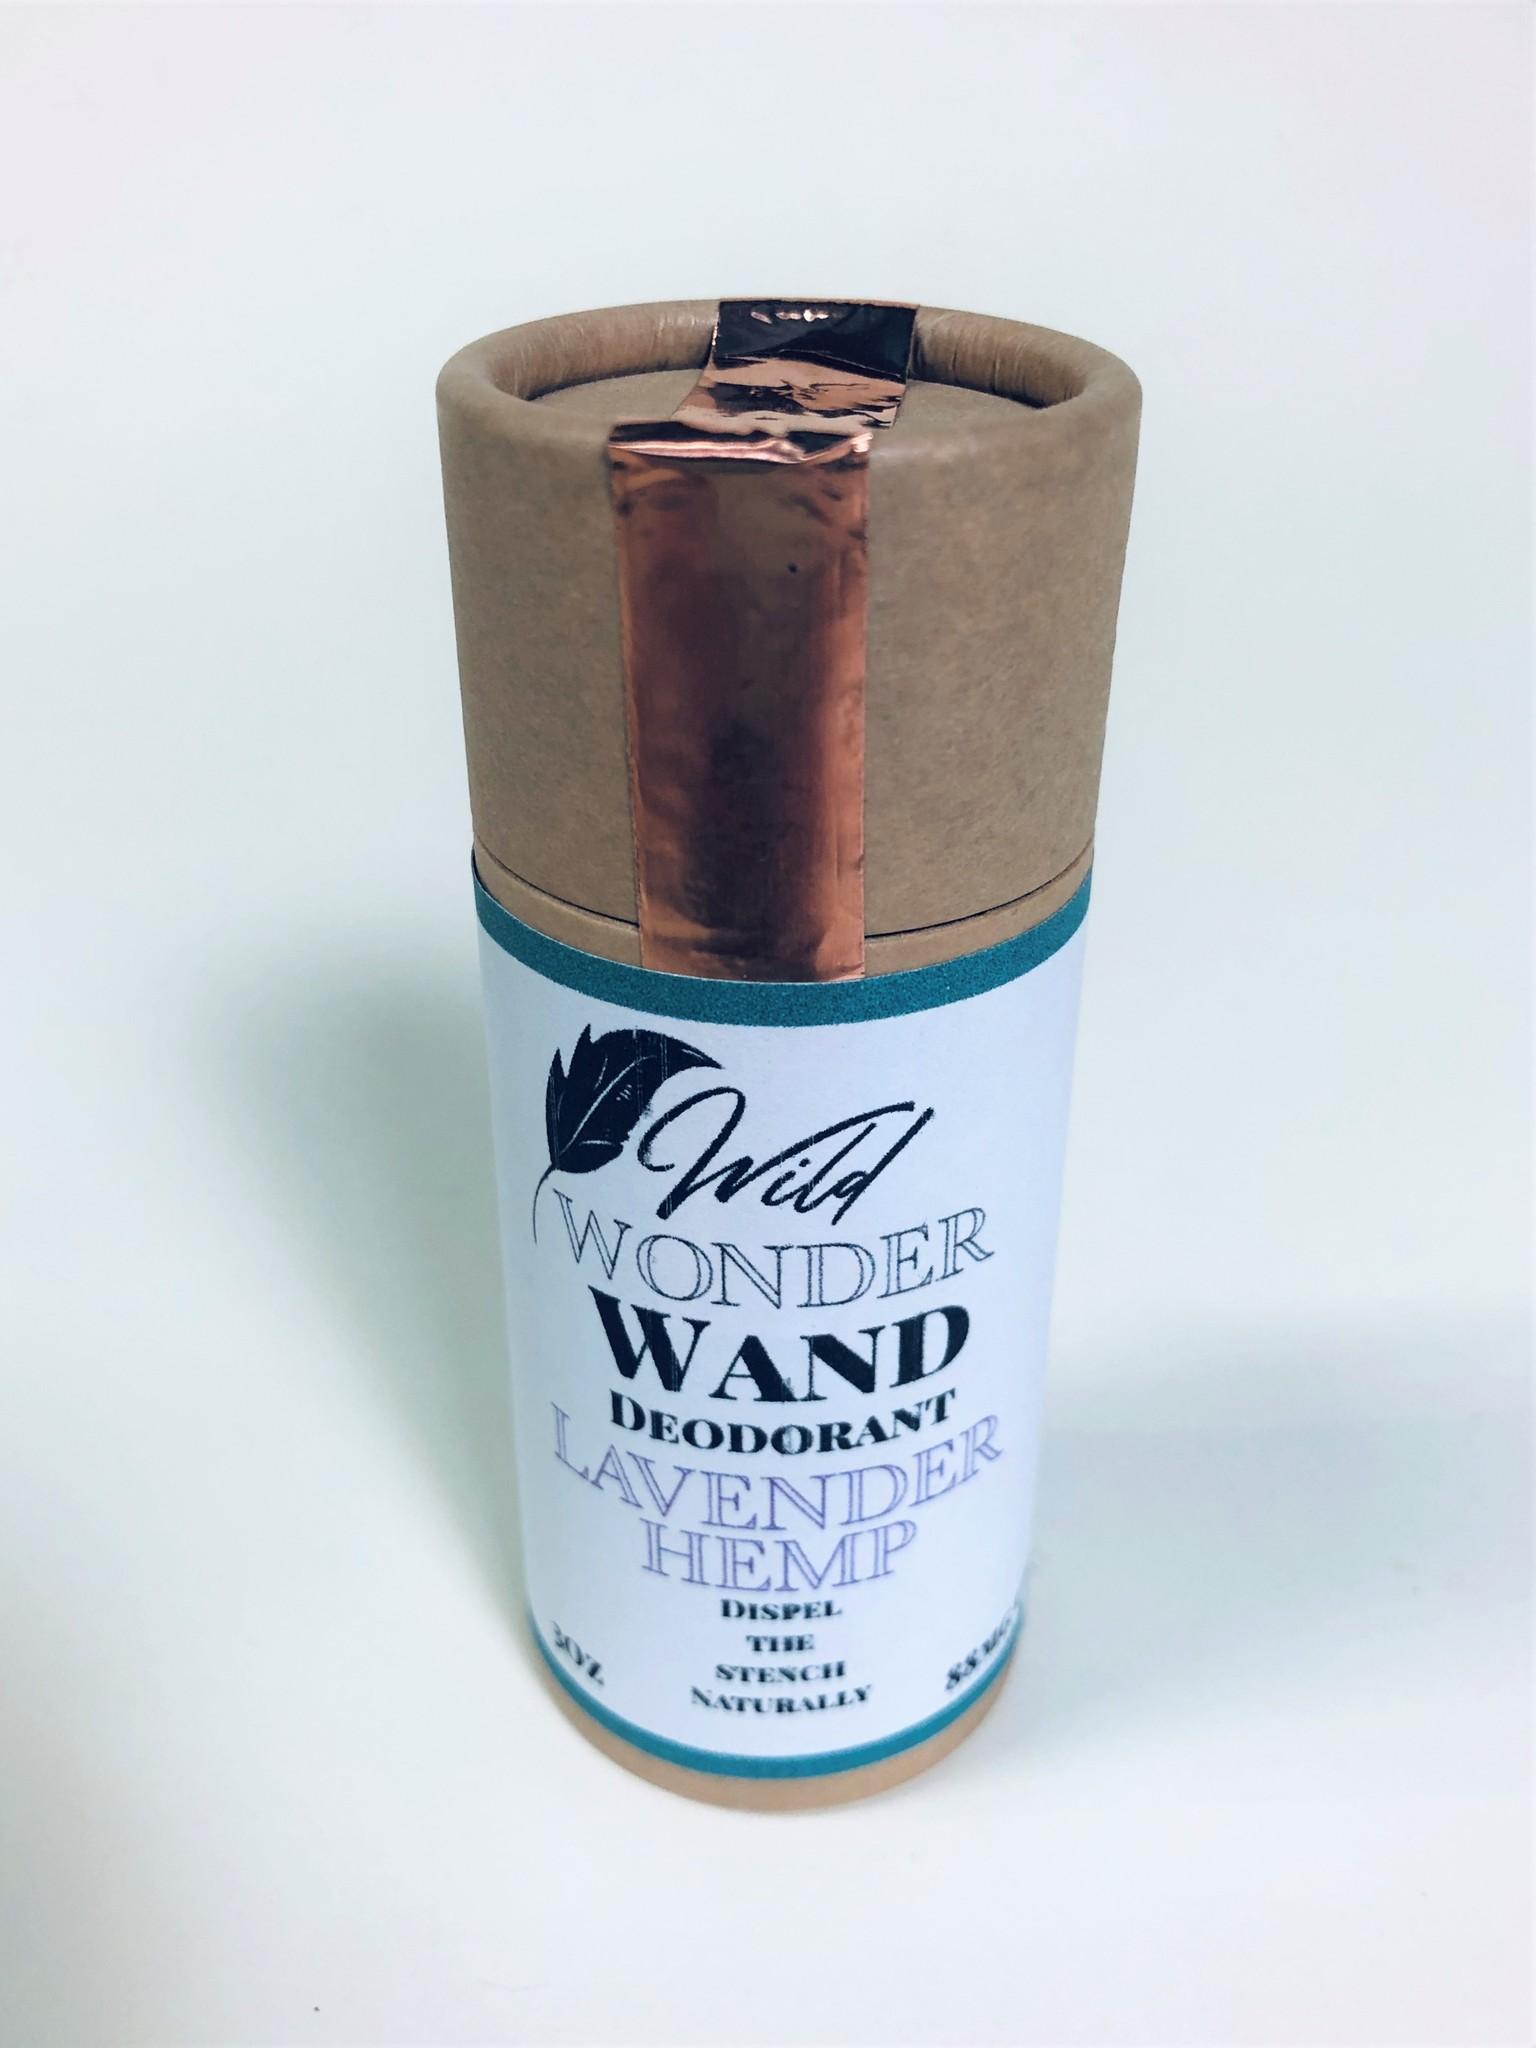 Wild Wonder Lavender Hemp Deodorant